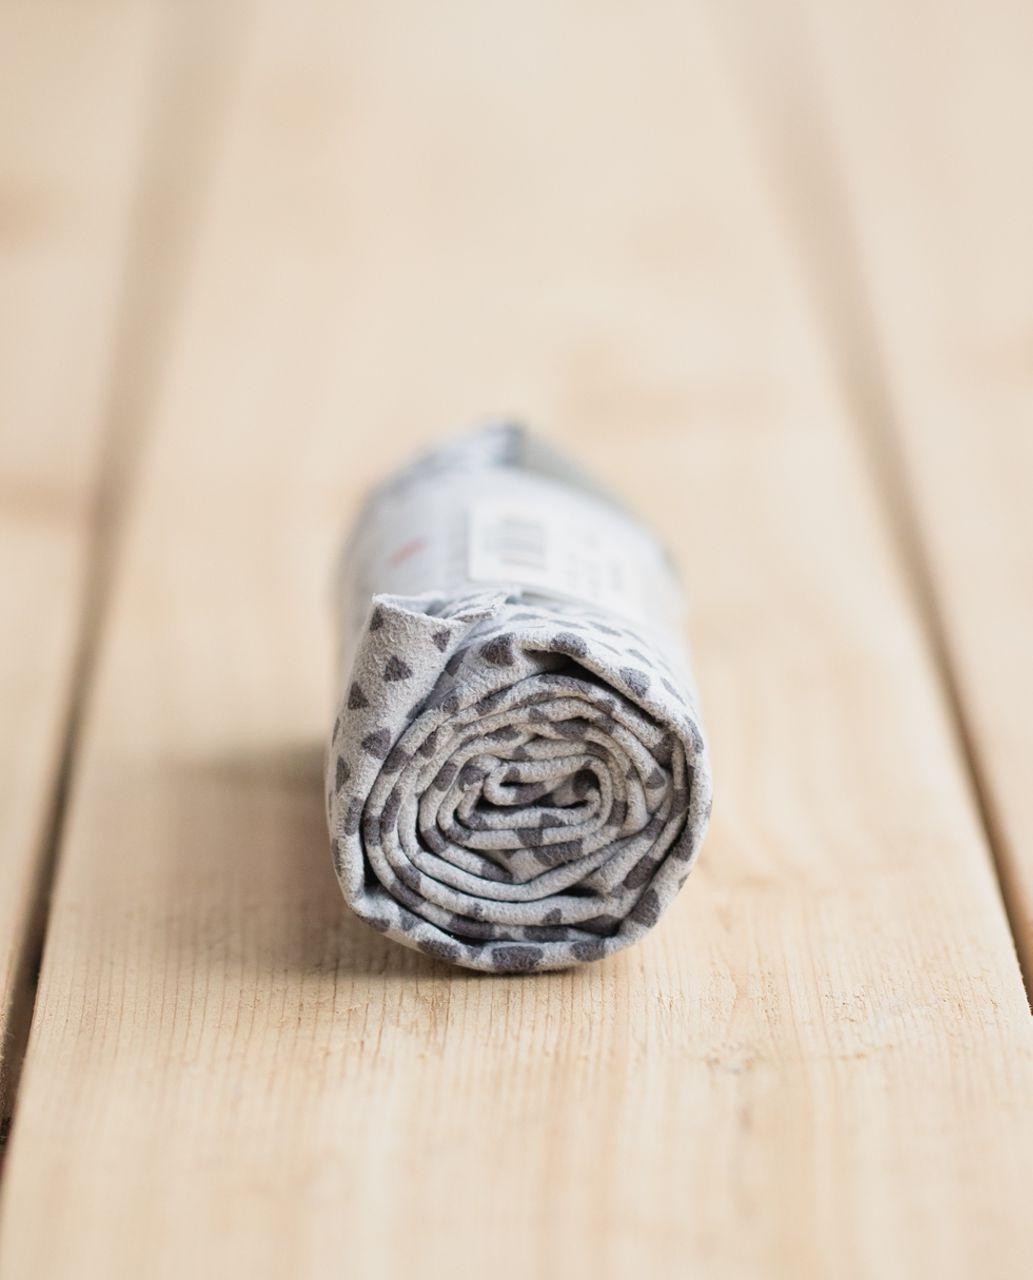 Lululemon The (Small) Towel - Hyper Diamond Camo Silver Spoon Slate